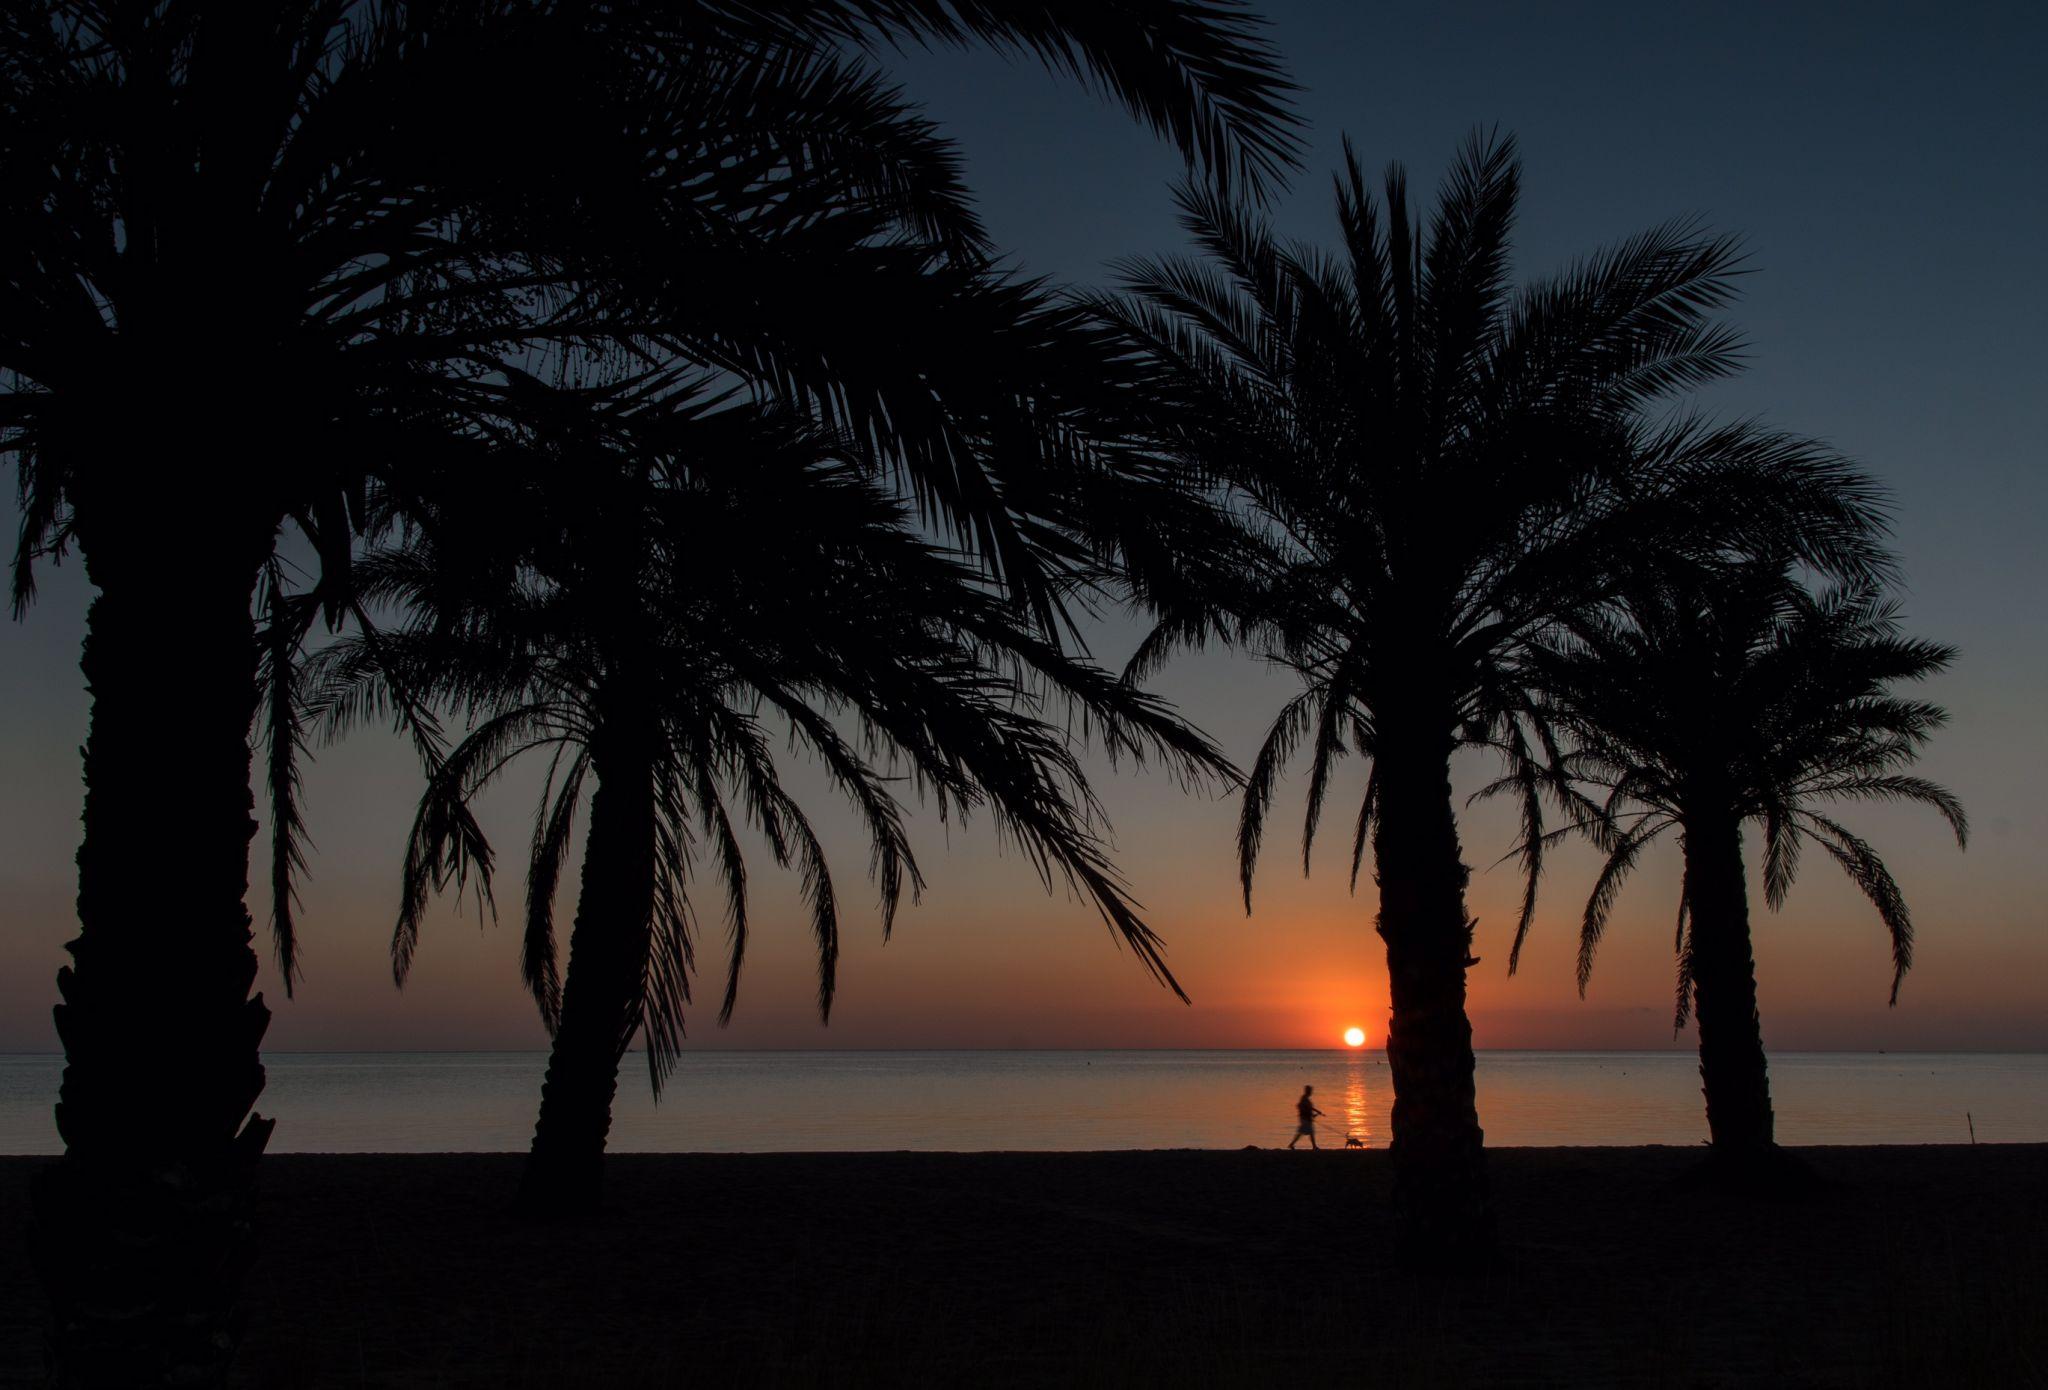 Playa de Les Albaranes, Dénia, Spain